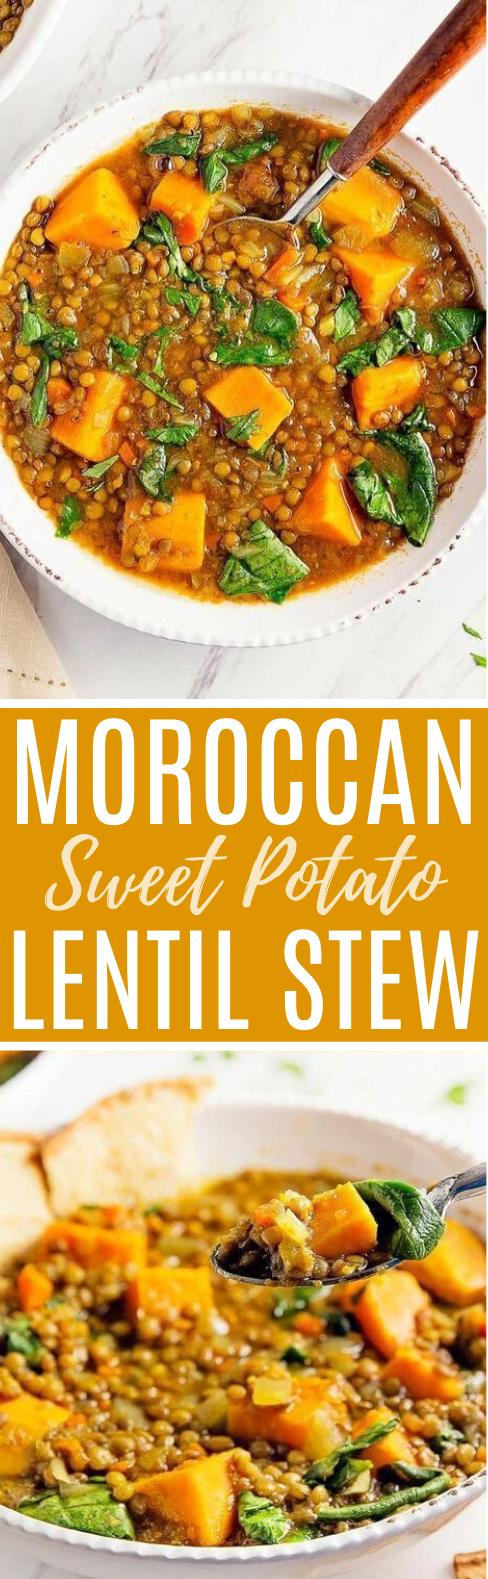 Moroccan Sweet Potato Lentil Stew #vegan #dinner #soup #stew #glutenfree